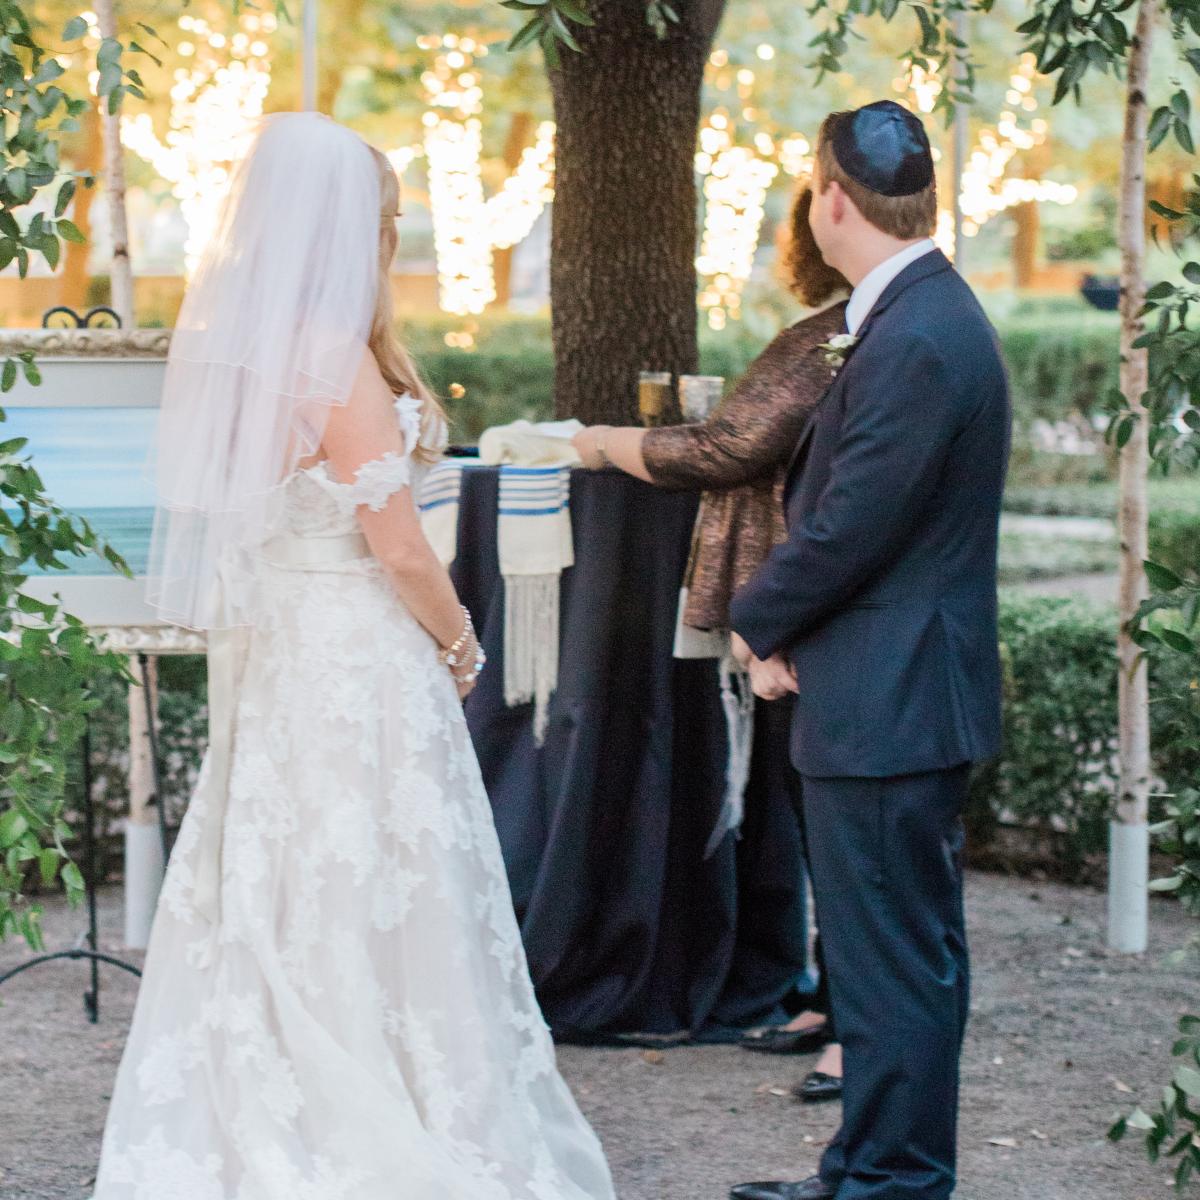 Kranz Wedding, chuppah